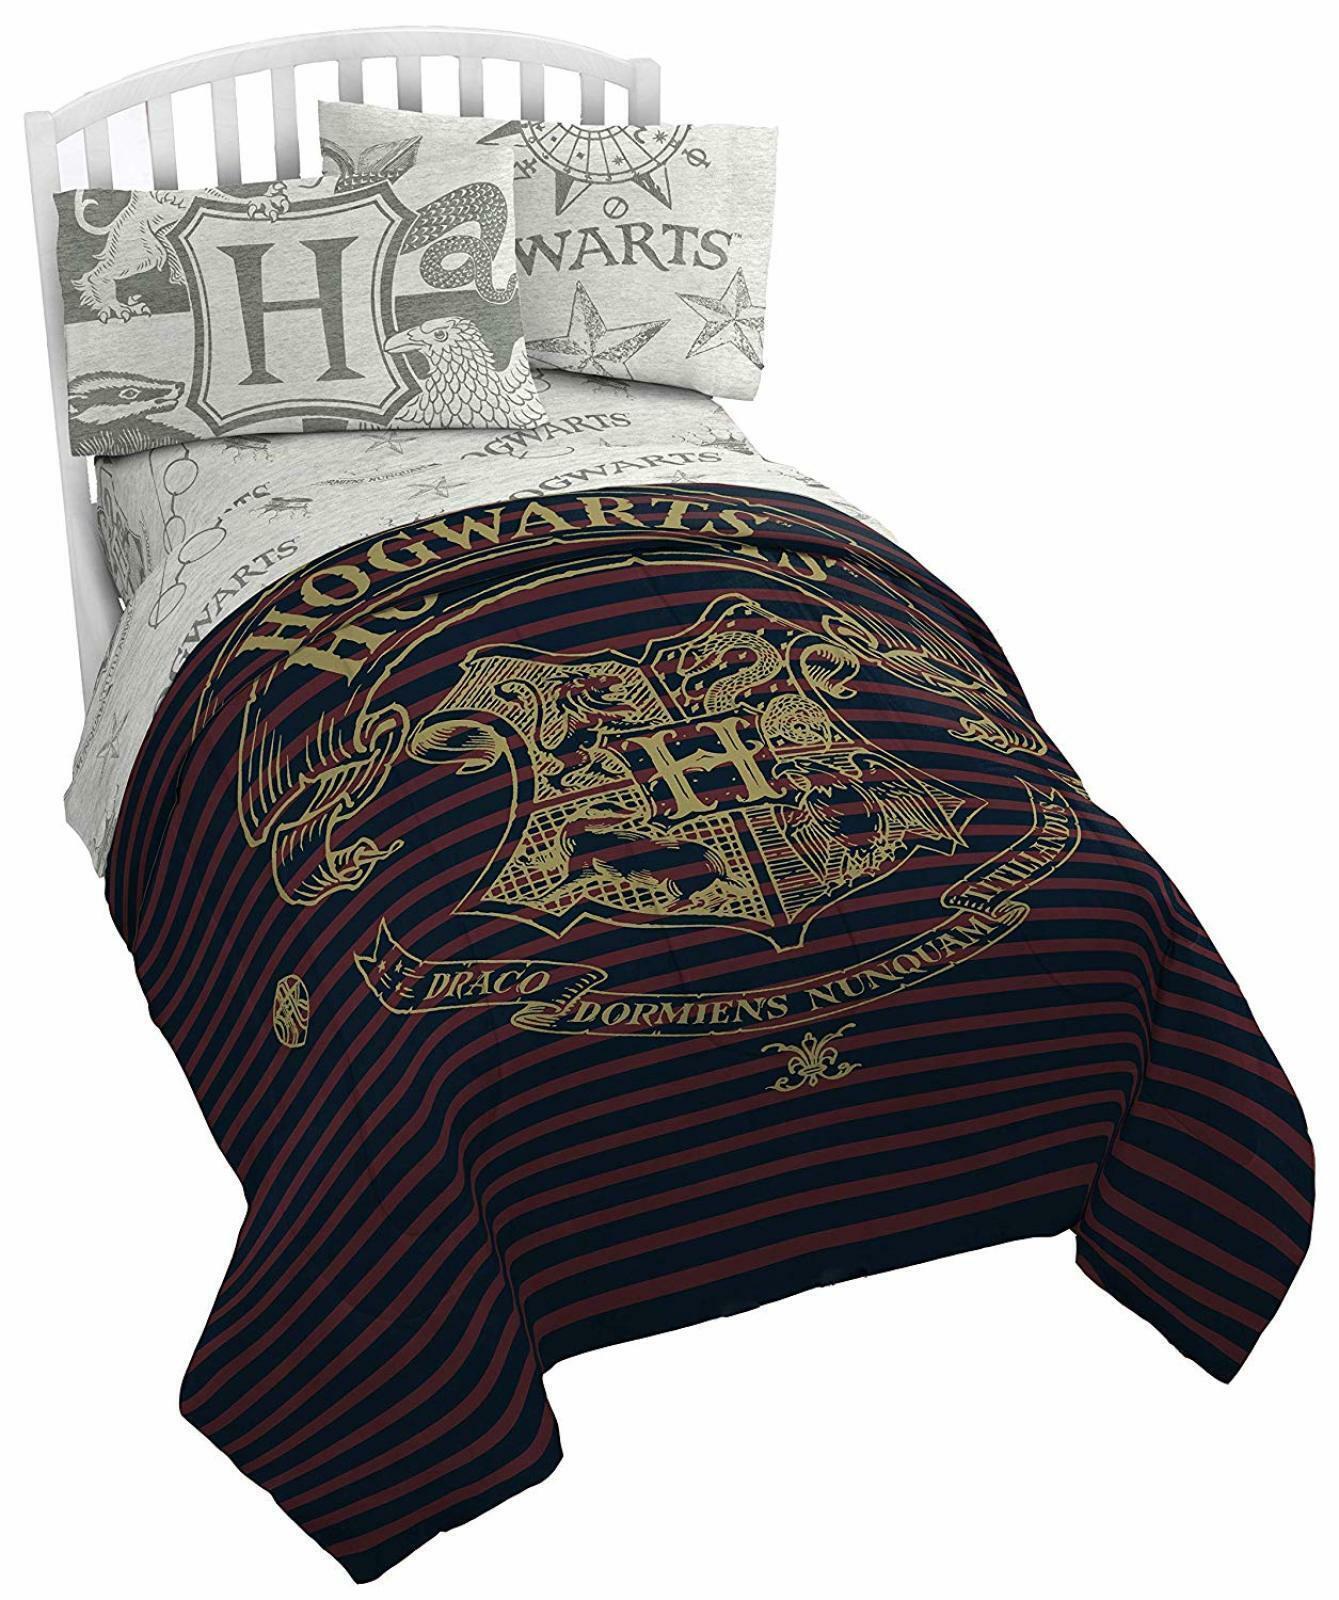 Harry Potter Spellbound Full Bed Set Reversible Comforter & Sheets Sheets Sheets Hogwarts 5Pc ba225f